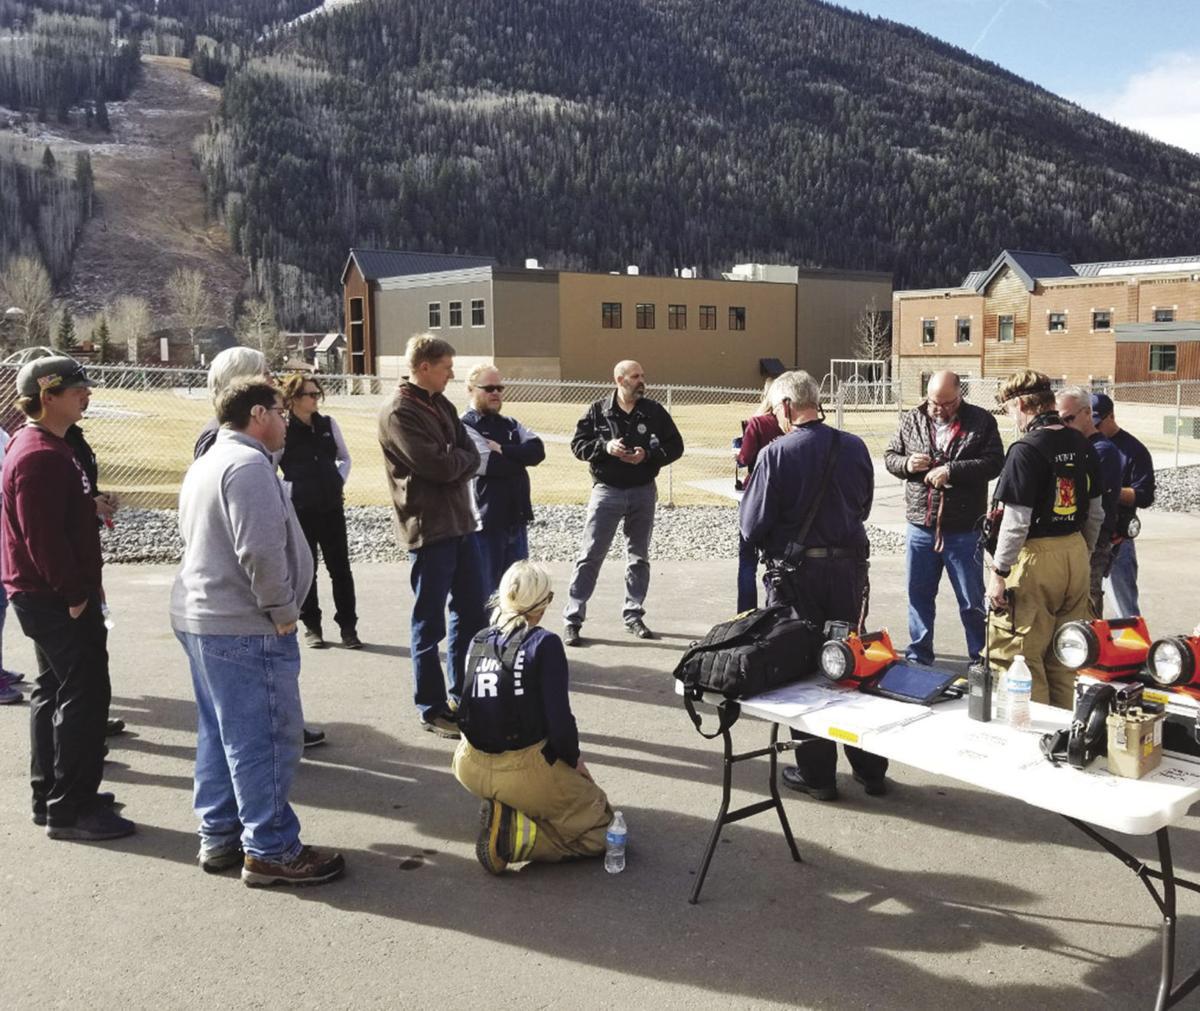 School Shooting Cctv: Parkland Shooting Causes Concern